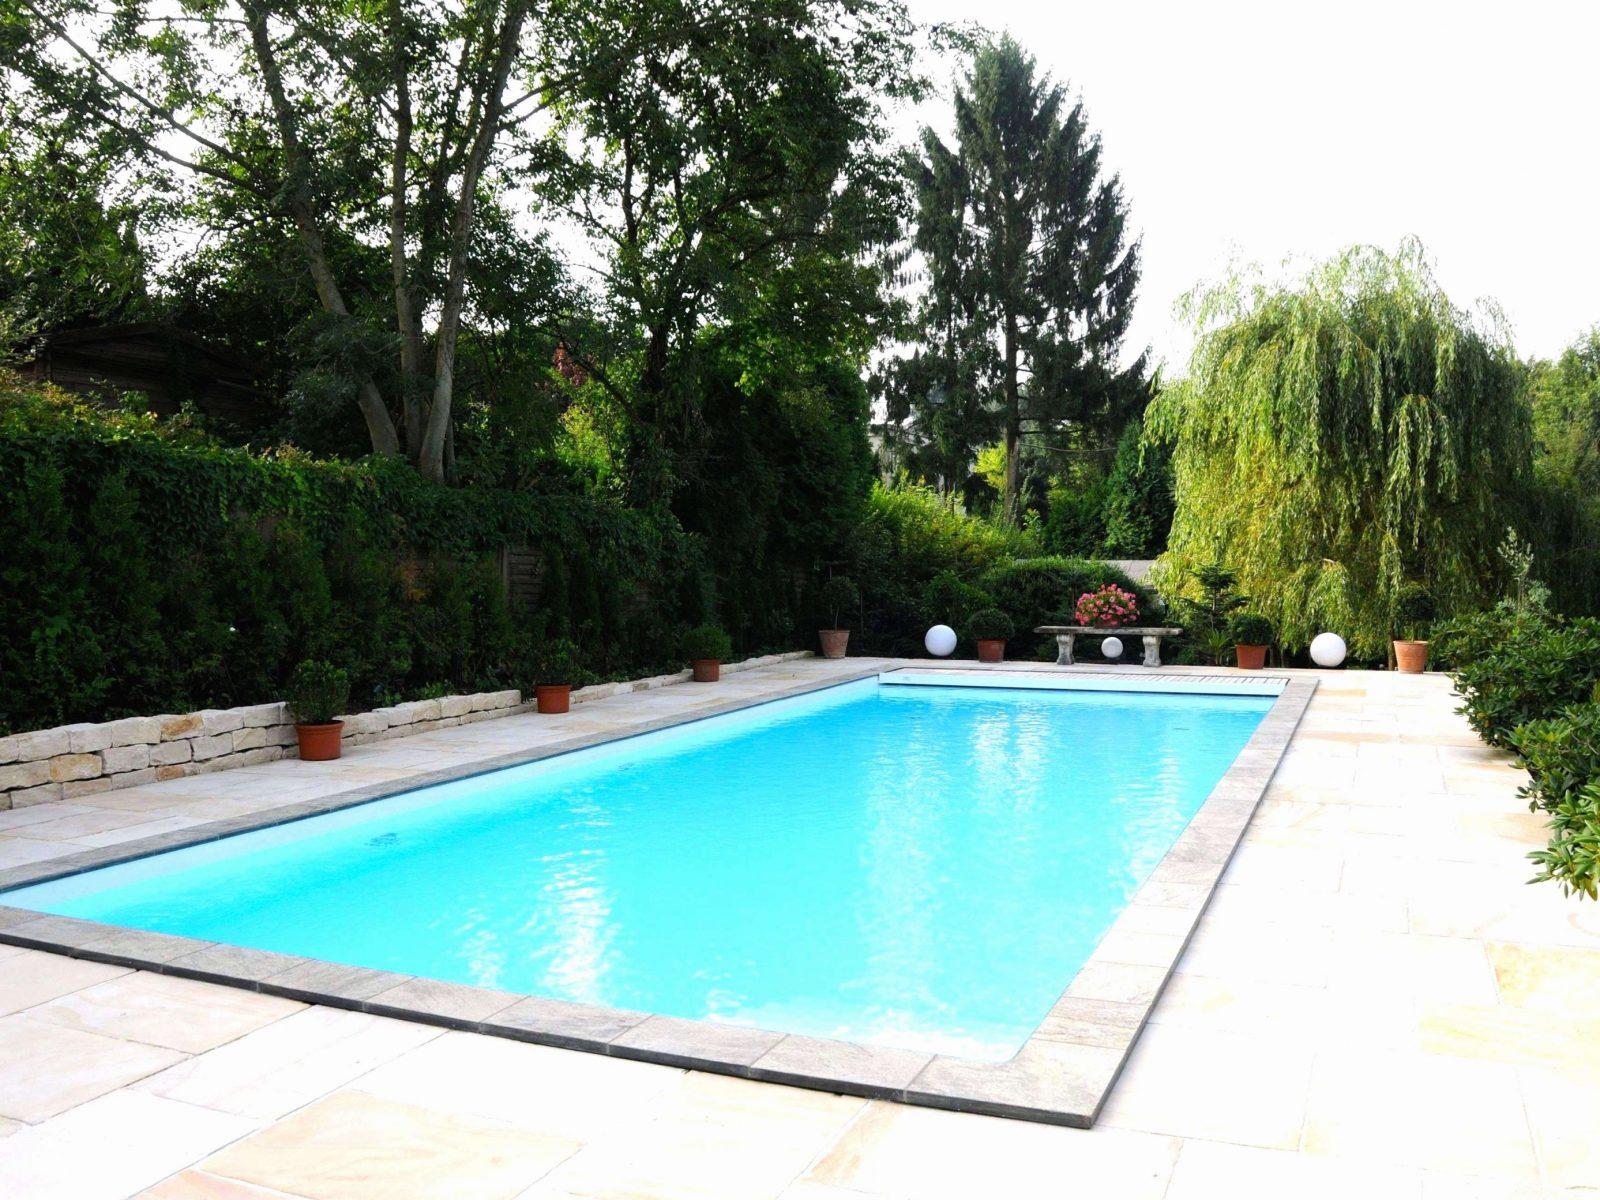 Pool Anlegen Garten Inspirierend Terrasse Gestalten Ideen Pool von Garten Gestalten Mit Pool Photo